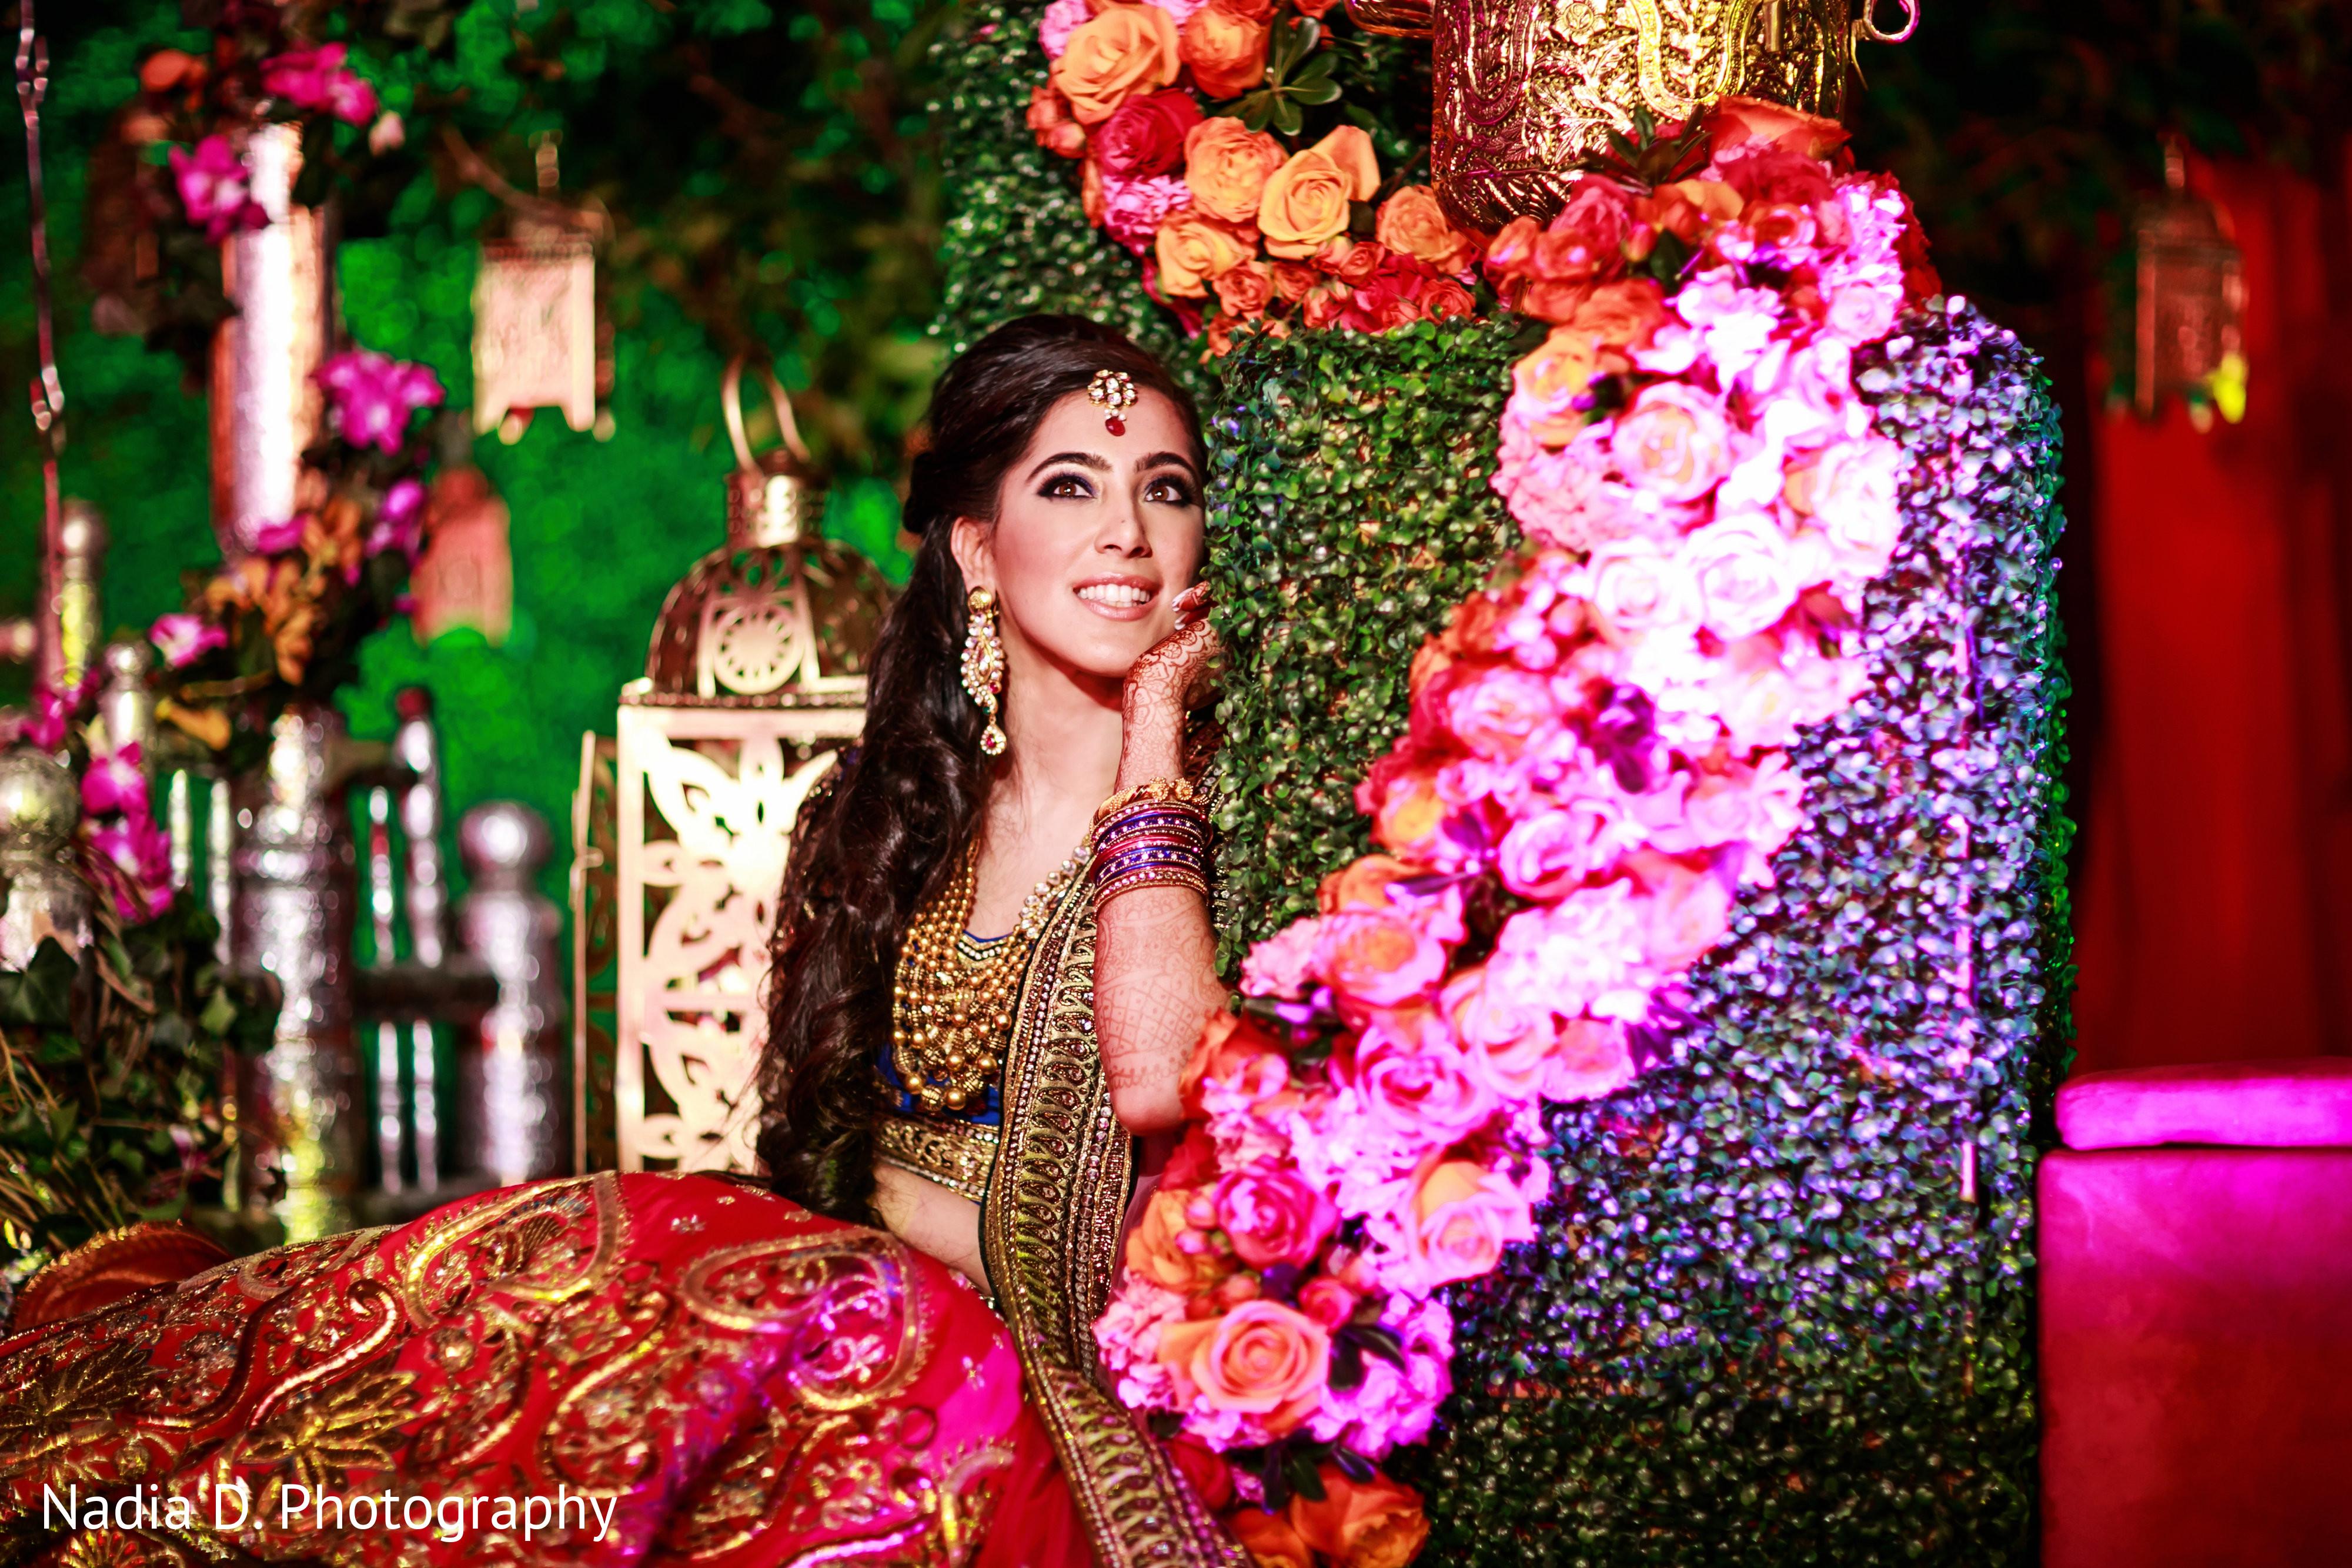 Long Island, NY Sikh Wedding by Nadia D. Photography | Post #5934